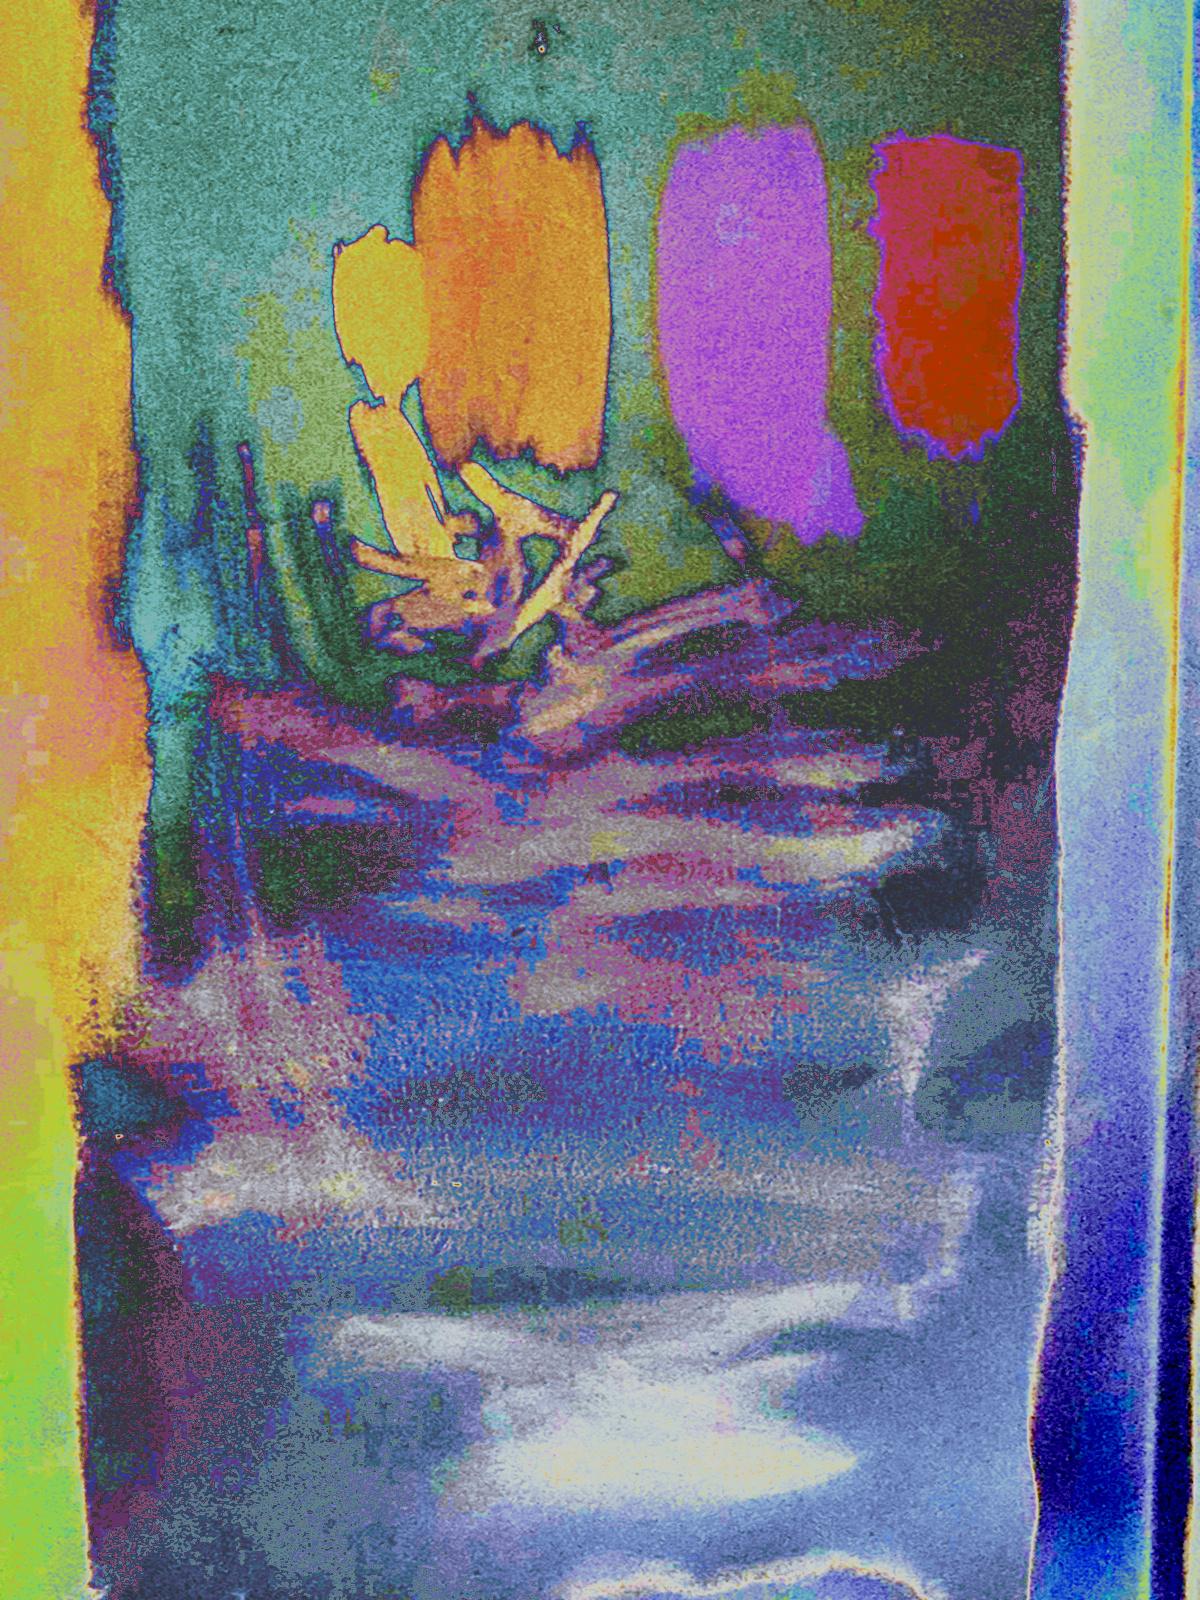 AbstractExpressionism-NancysStudy3b-levl-hue3-curv52ext.jpg